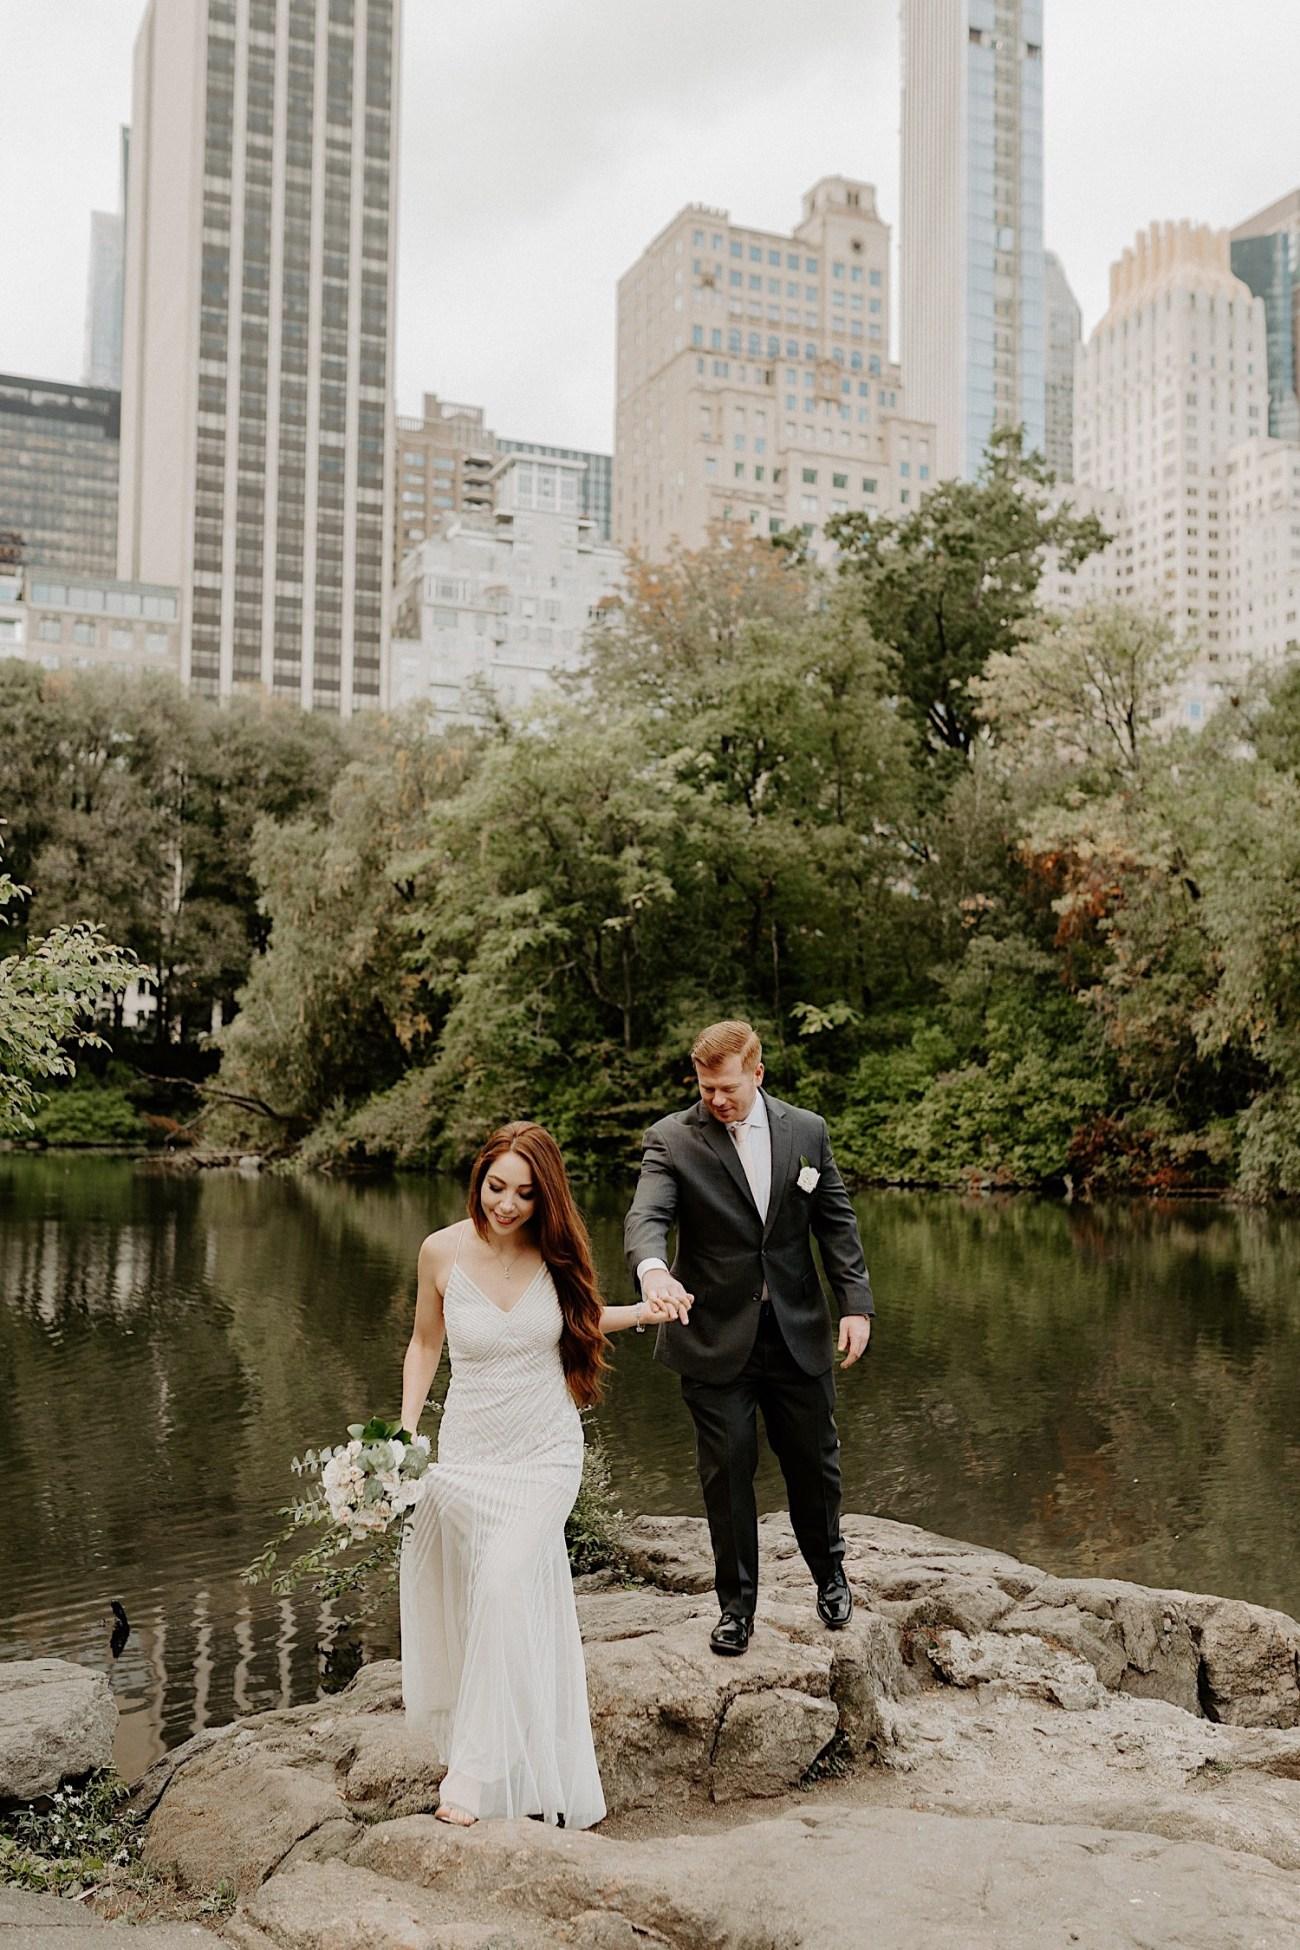 Central Park Wedding Photos Central Park Elopement NYC Wedding Photographer 08